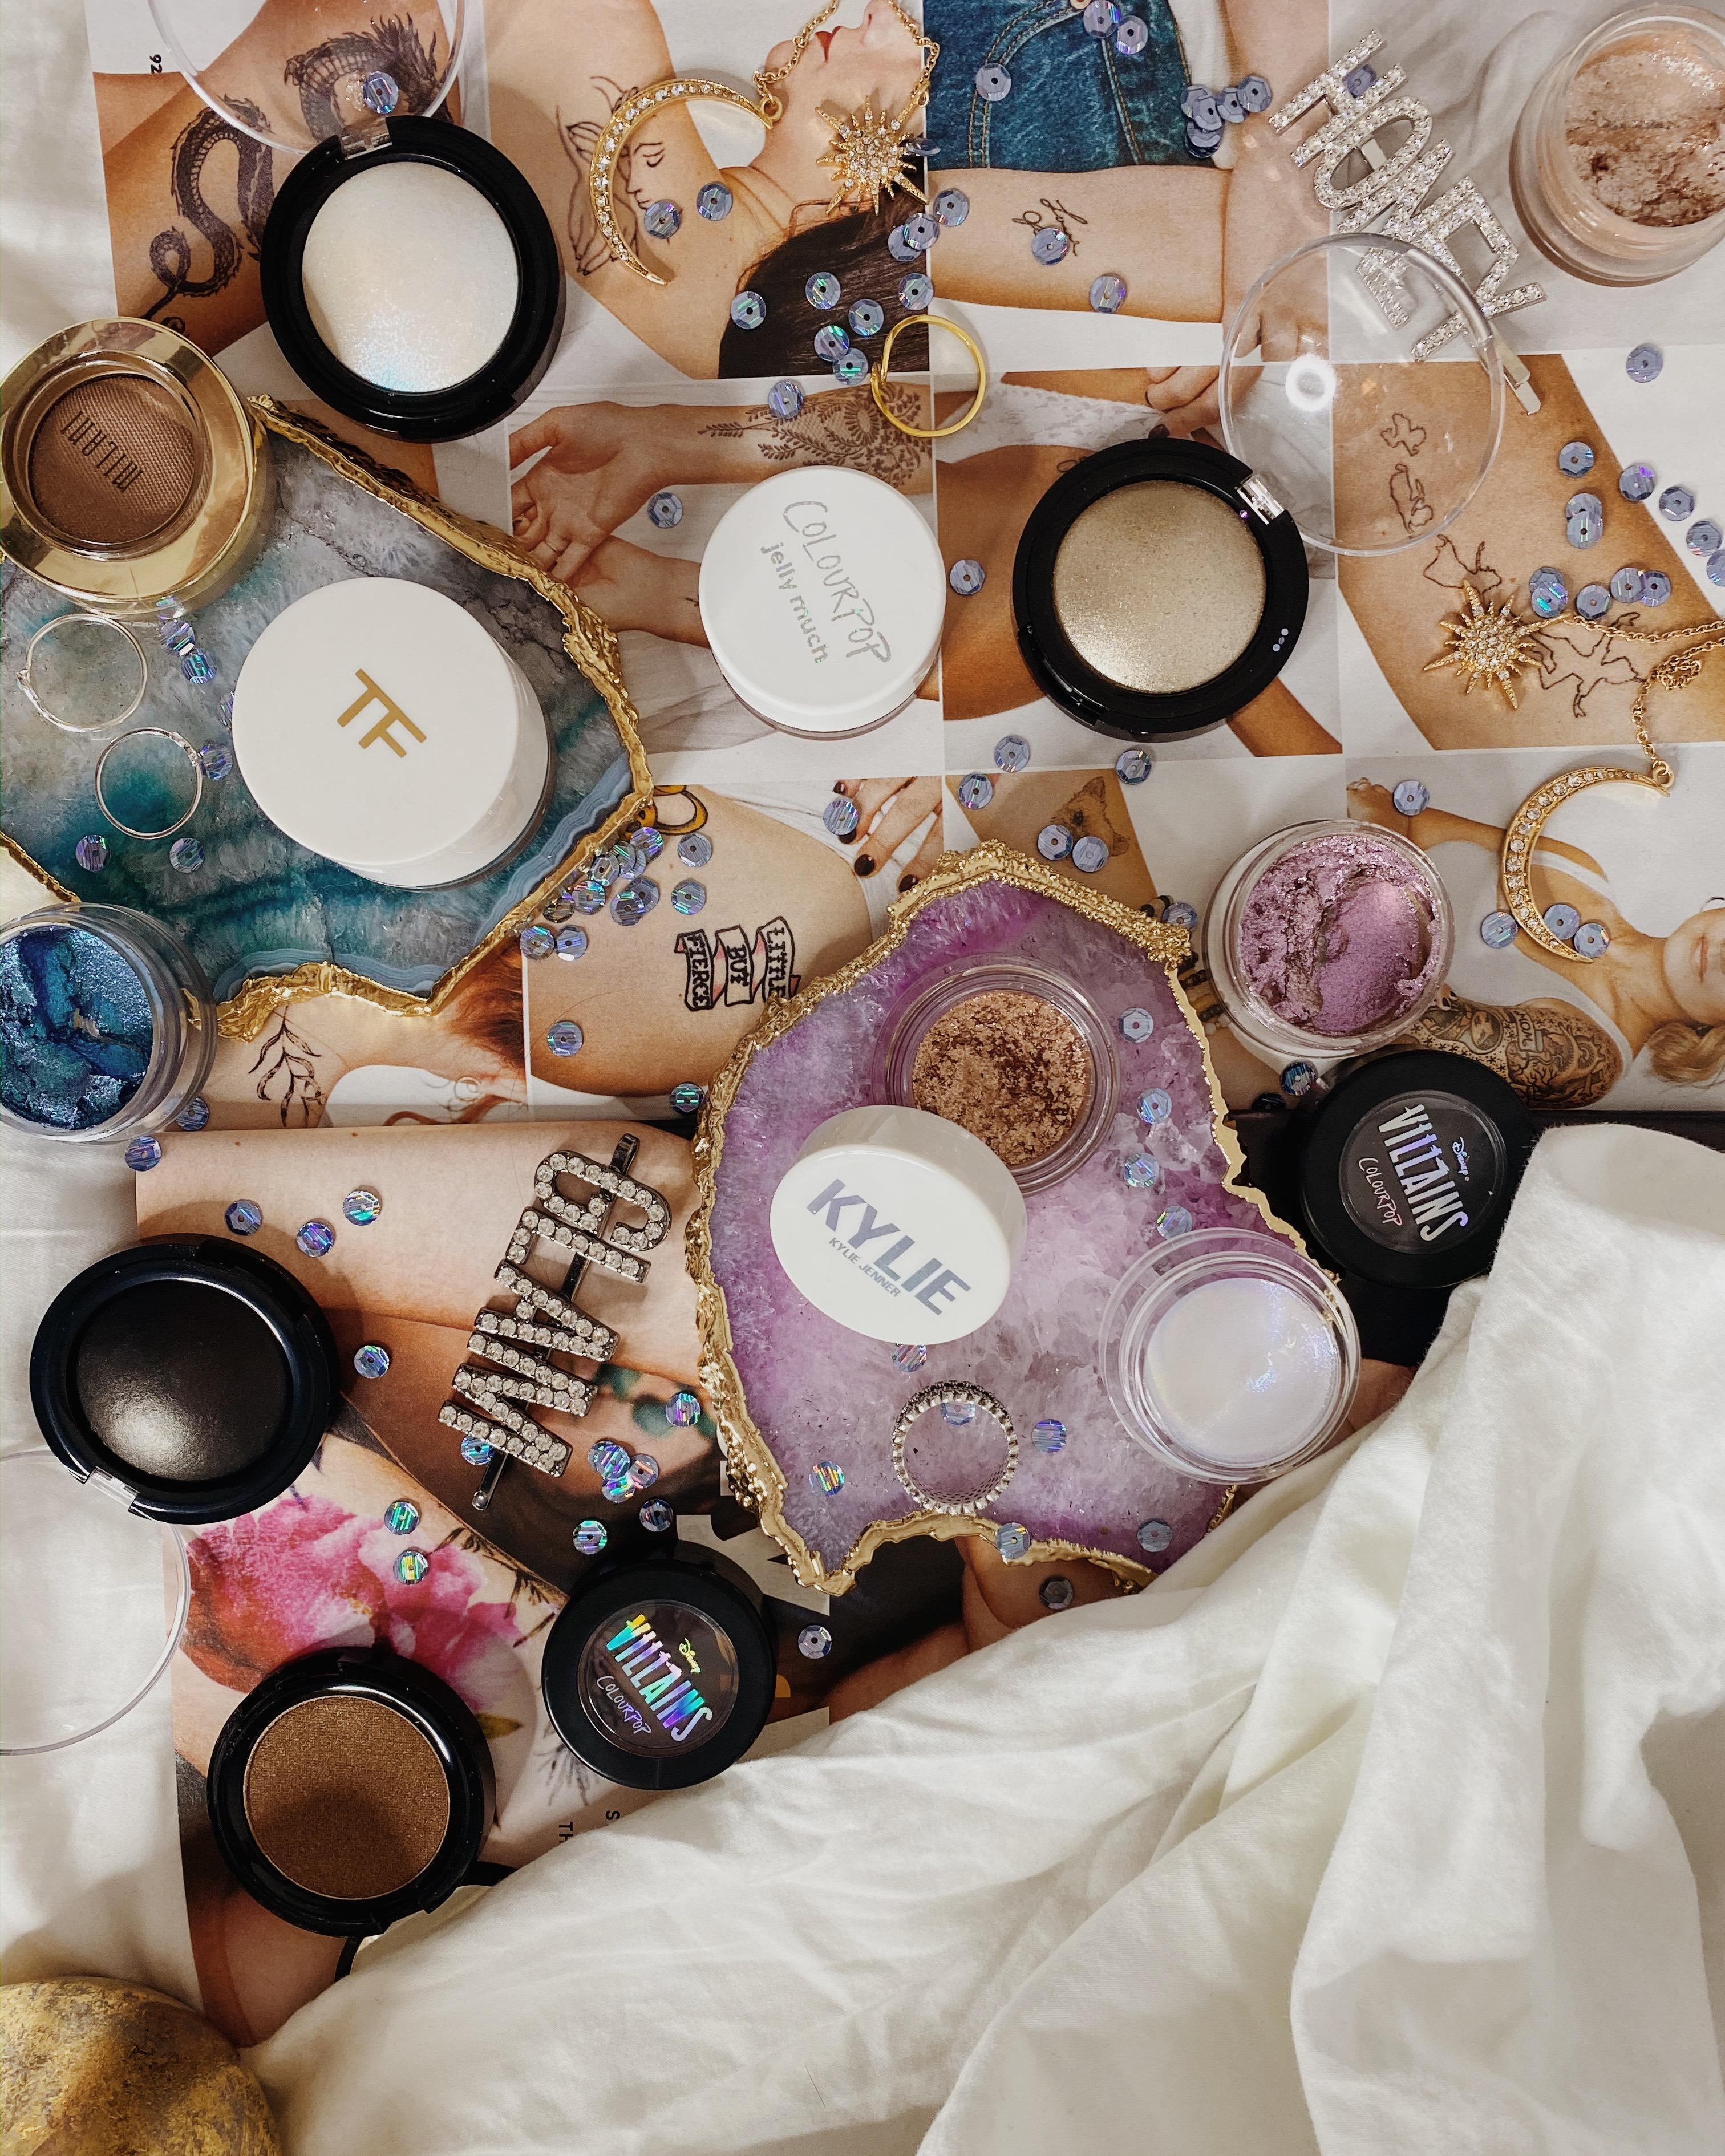 Shimmer Eye Glaze by Kylie Cosmetics #14